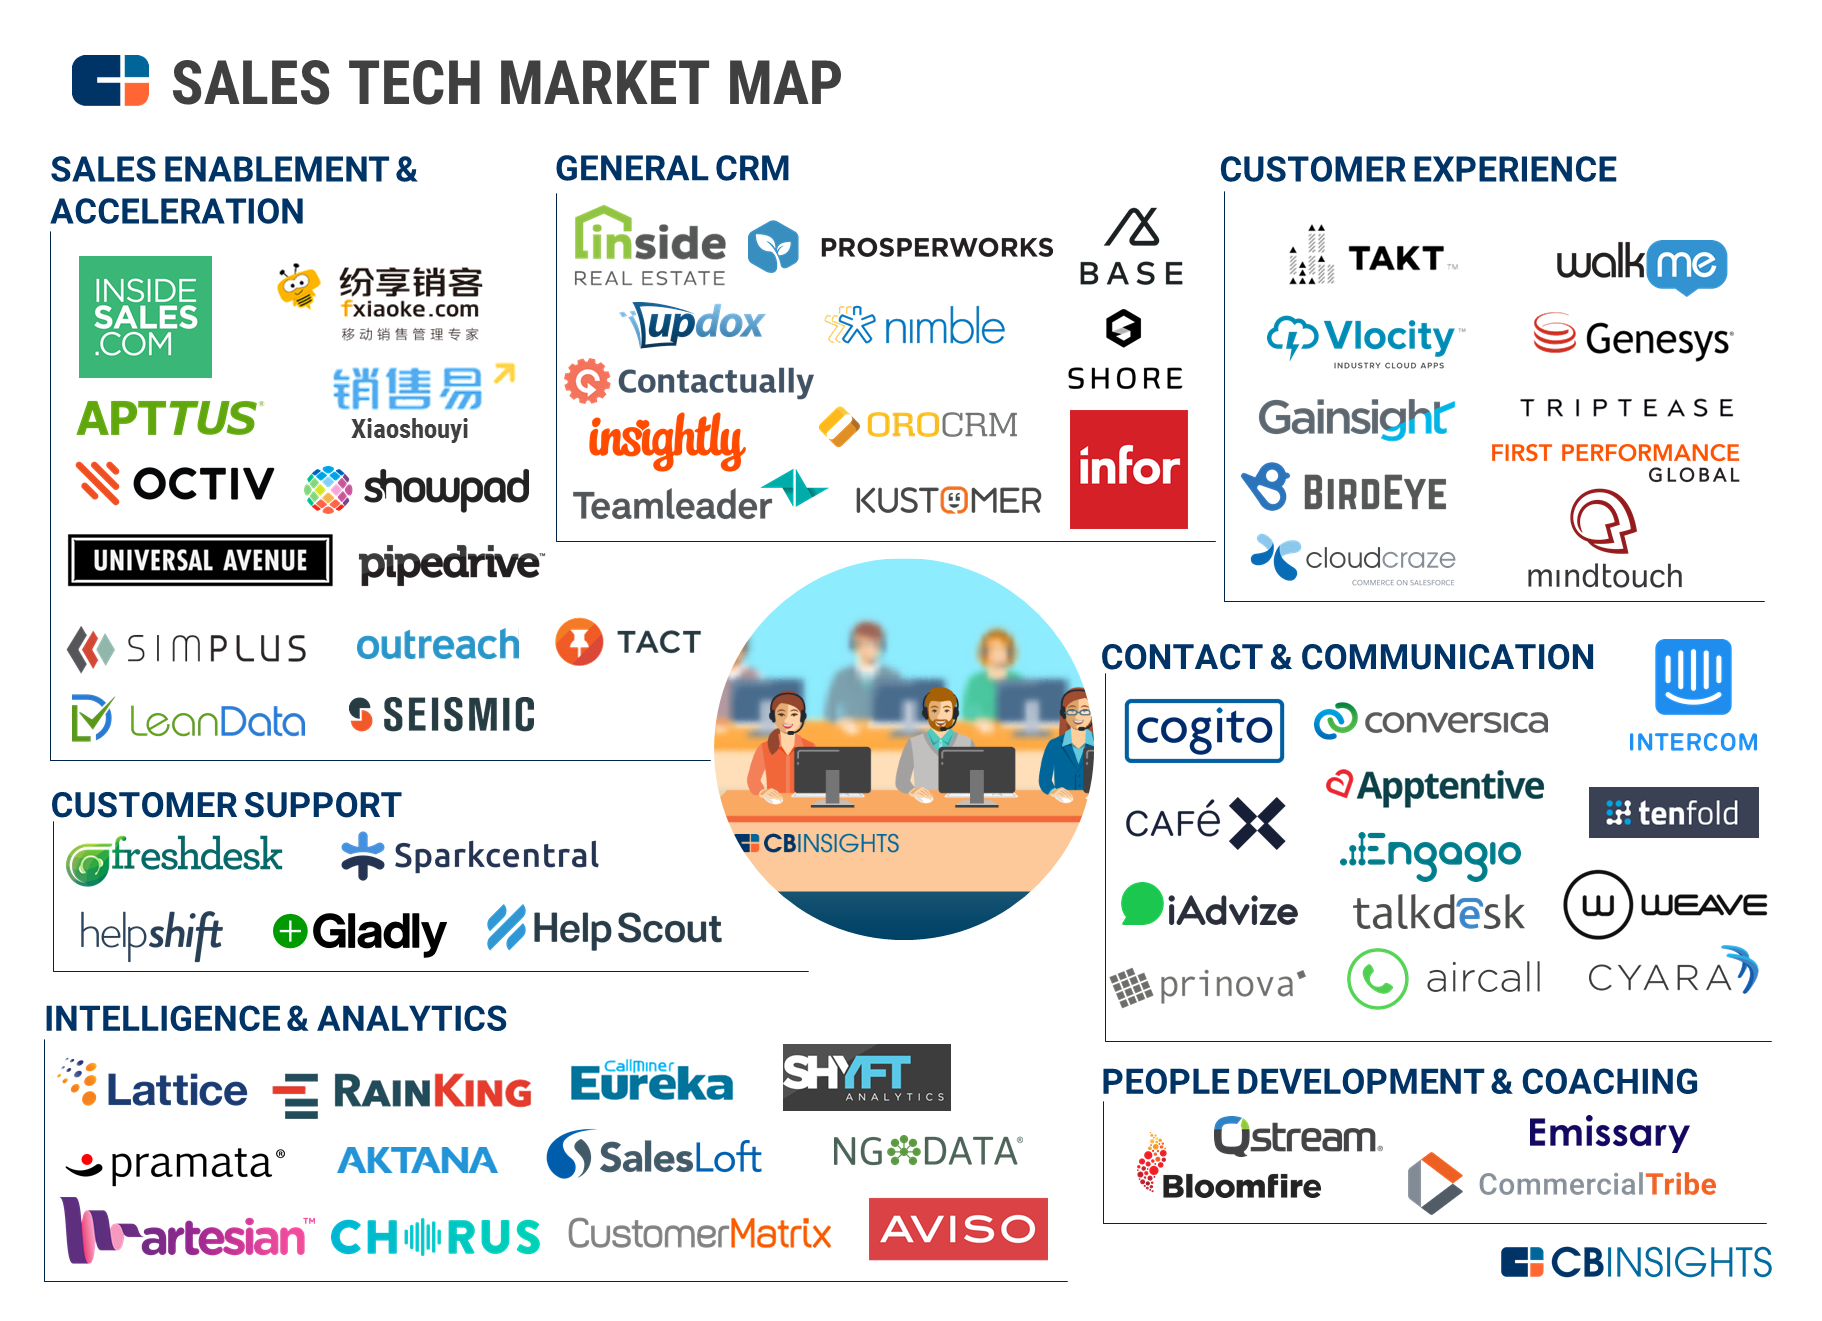 71 Market Maps Covering Fintech, CPG, Auto Tech